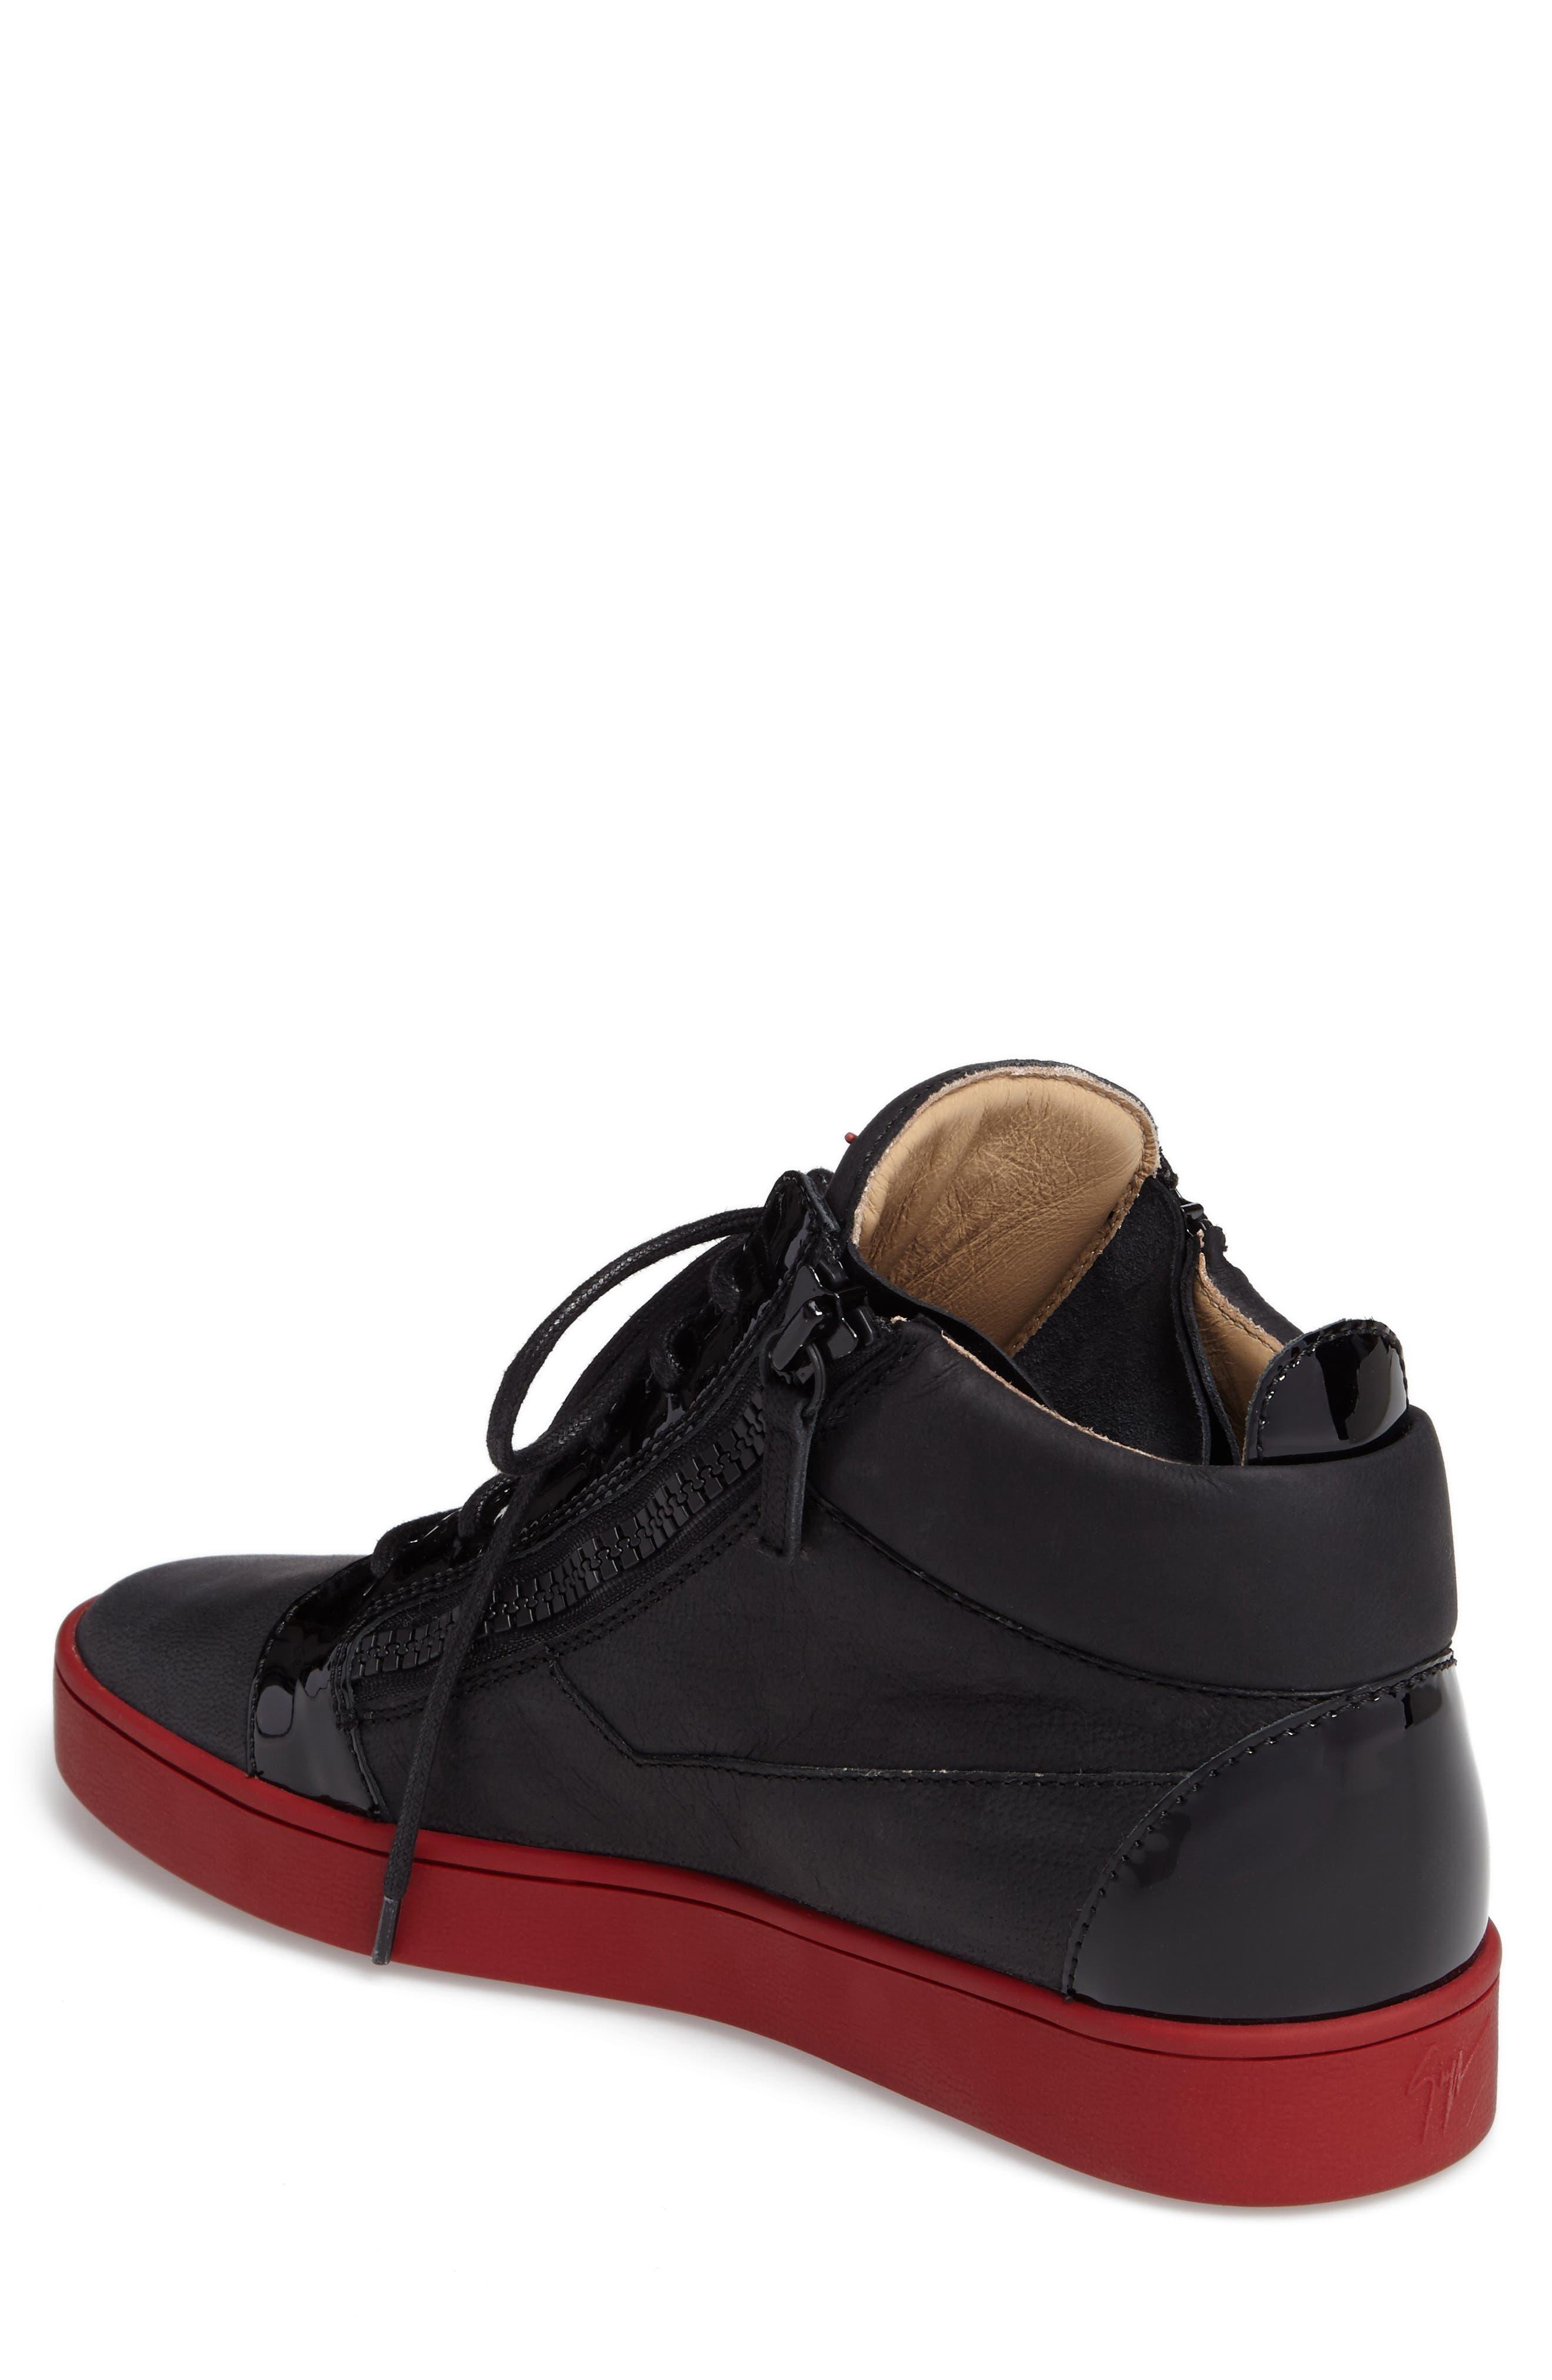 Mid Top Sneaker,                             Alternate thumbnail 2, color,                             001